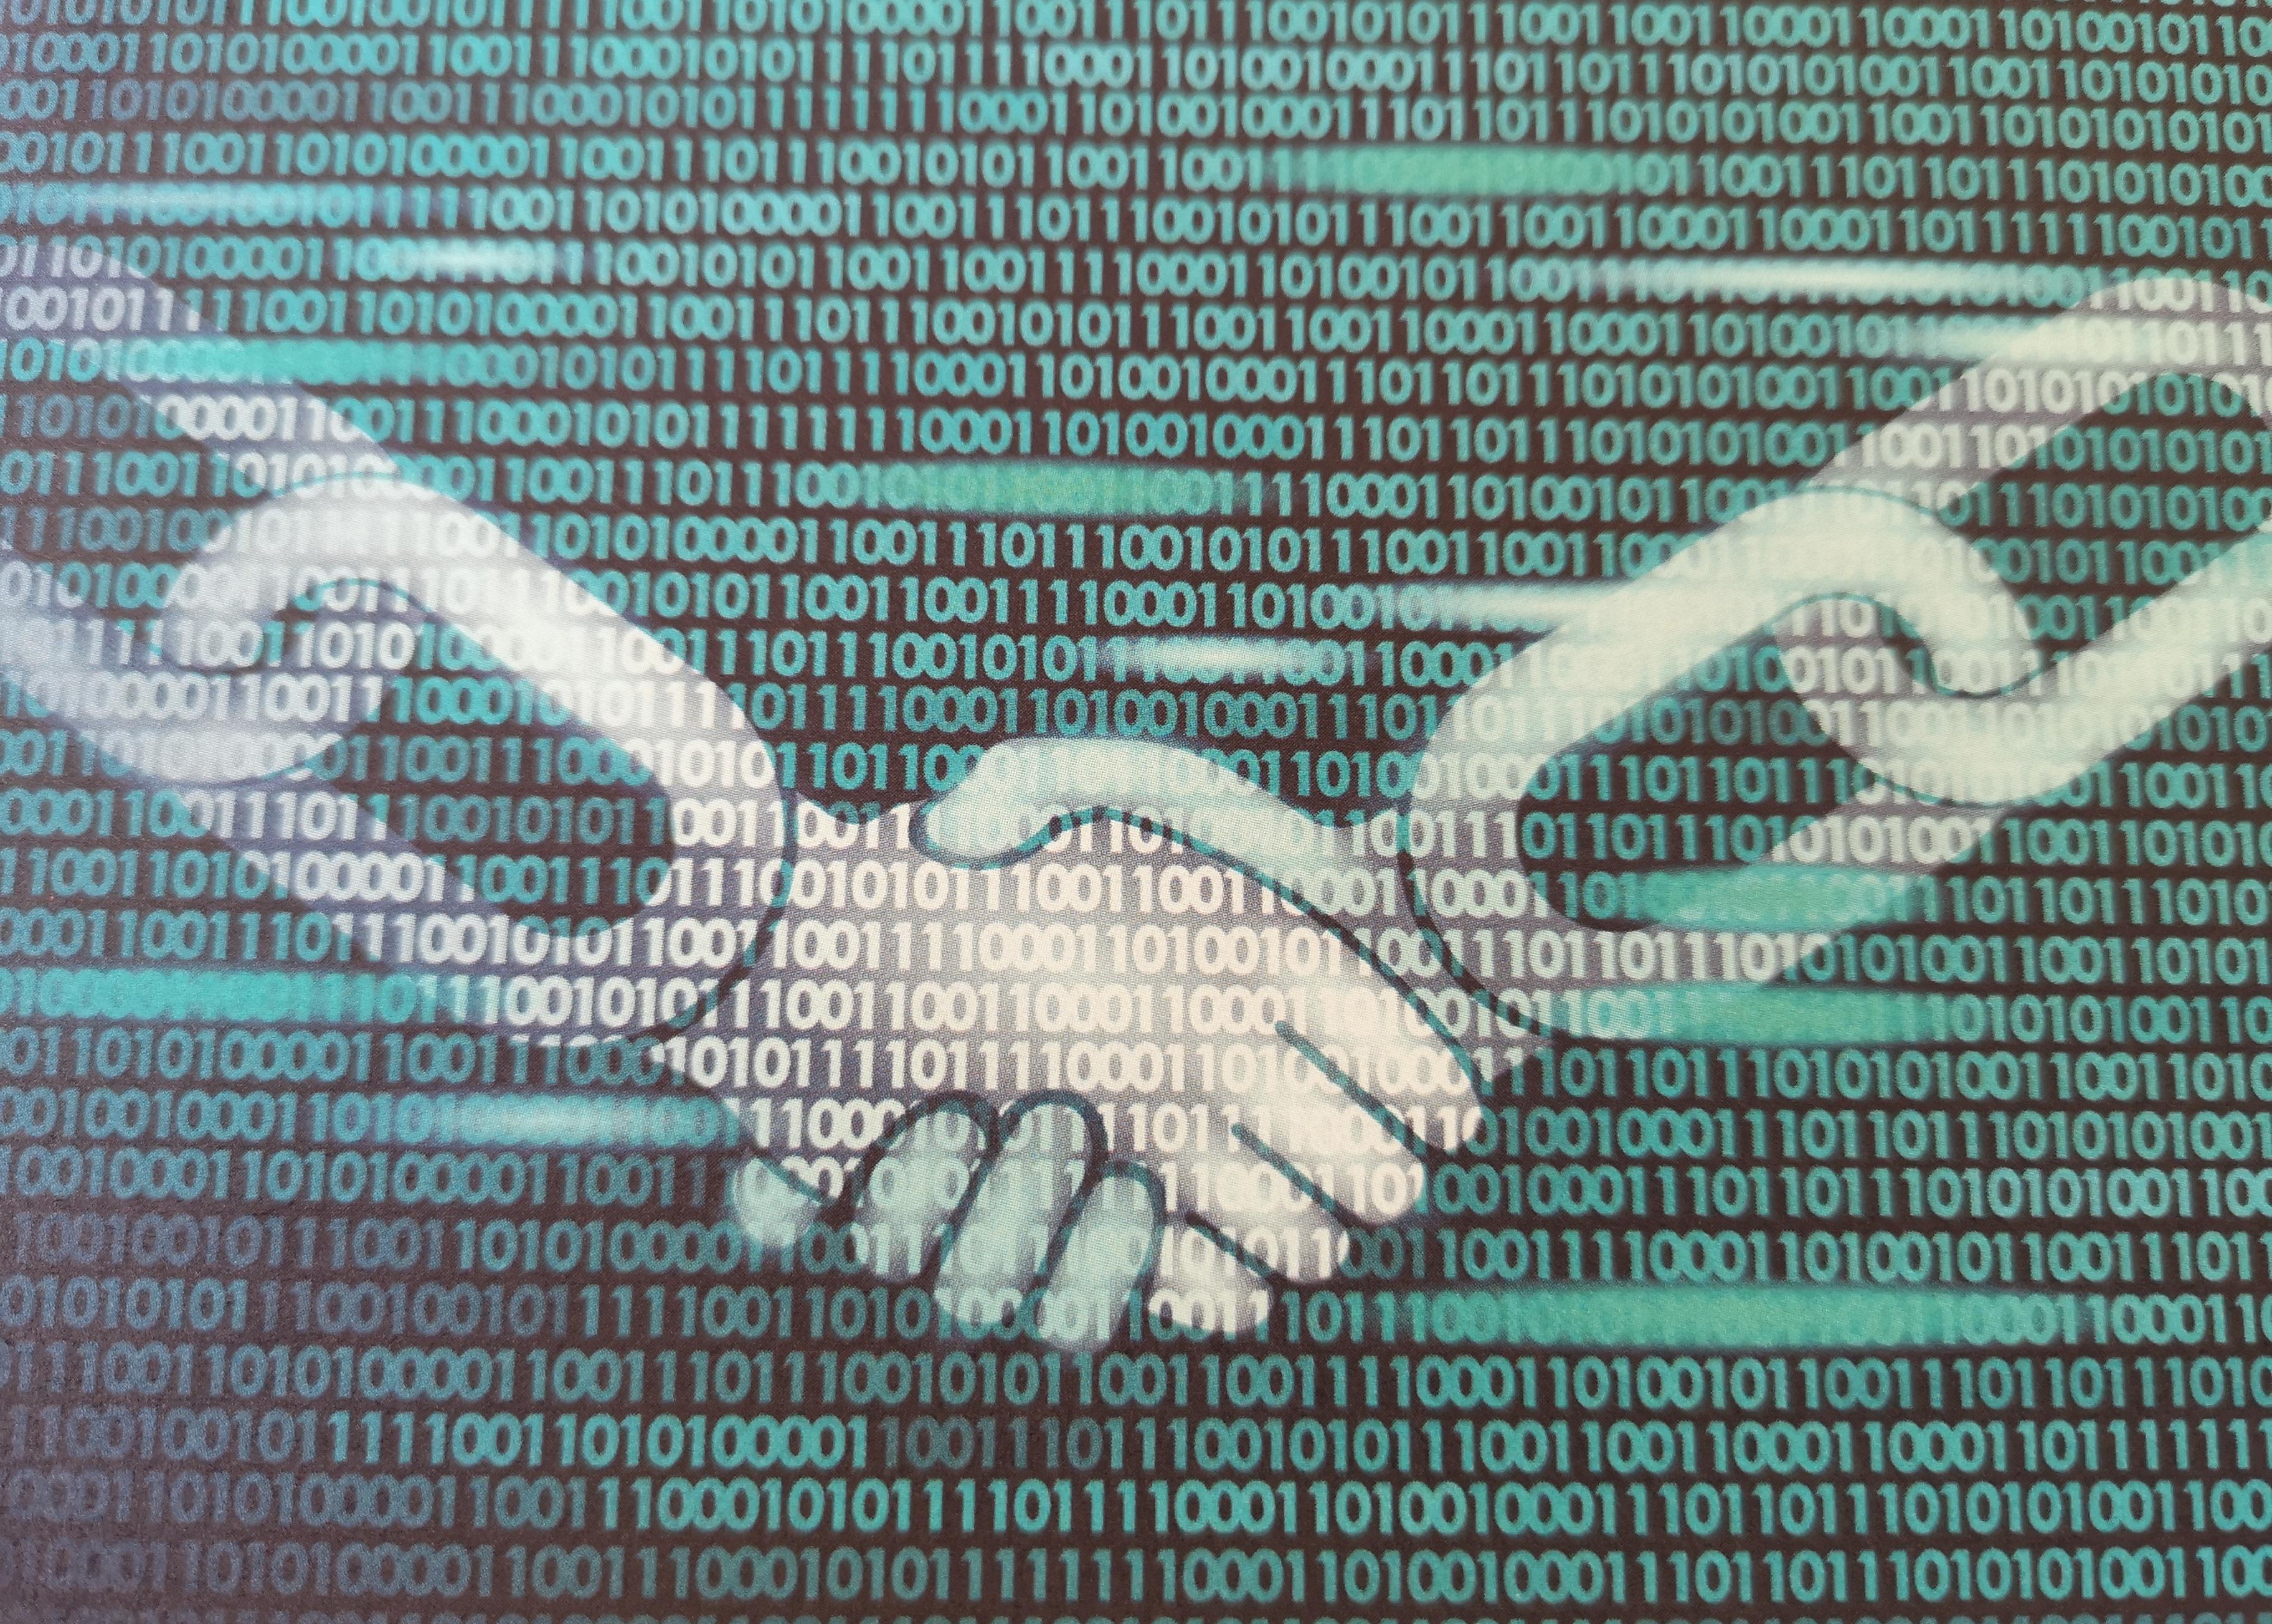 smart contract concept in blockchain